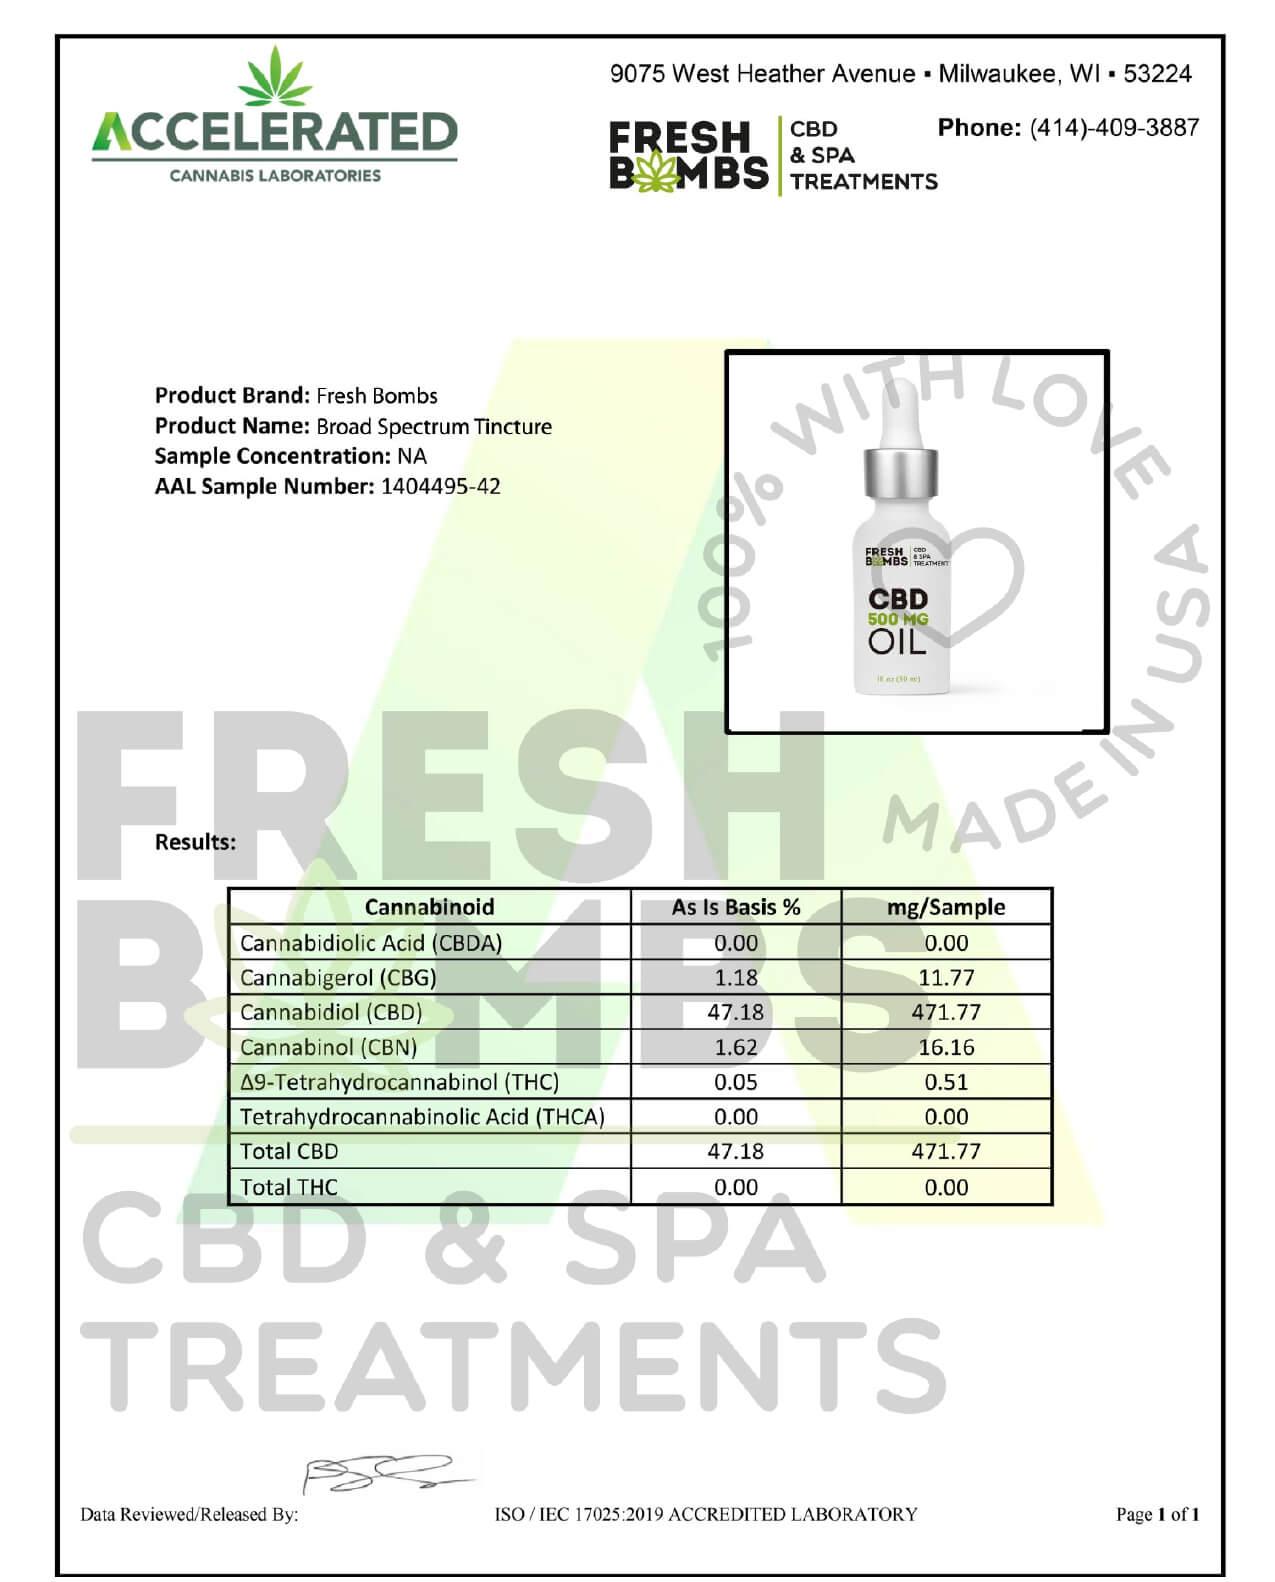 Fresh Bombs CBD Tincture Broad Spectrum Oil 500mg Lab Report